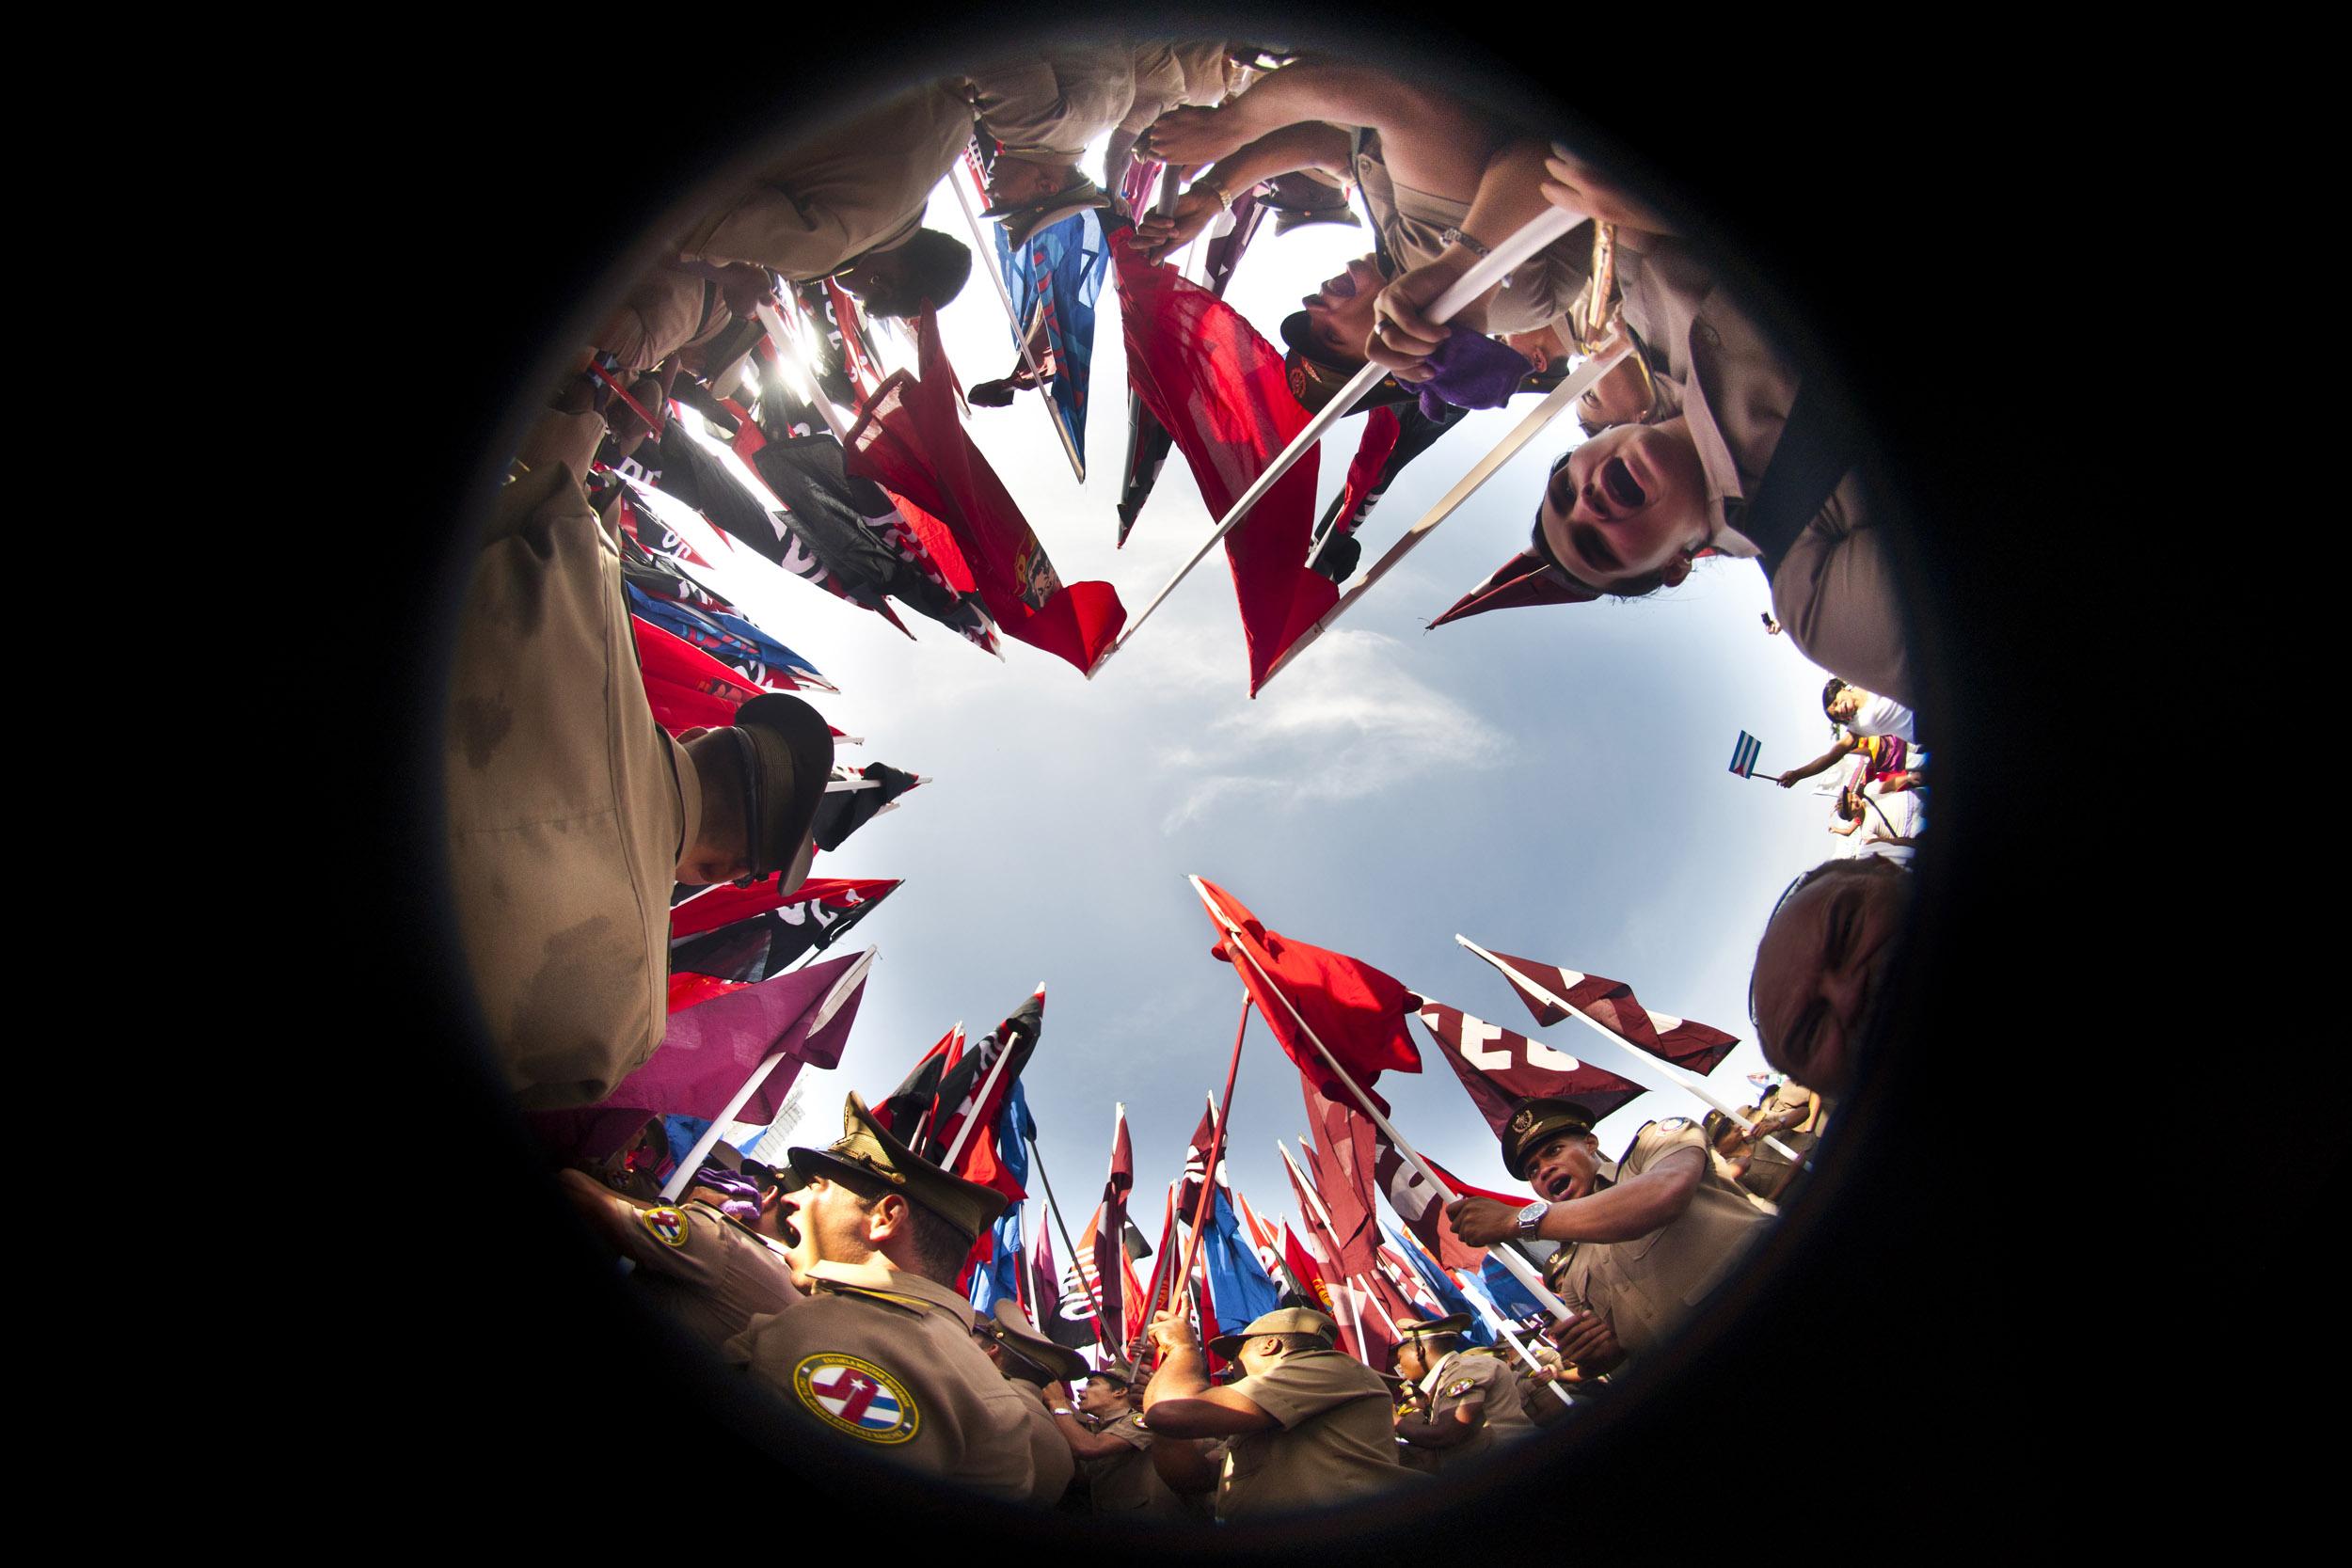 Bandera 03 - Prints 2. Ethnoland - Hector Garrido, Aerial and human photography